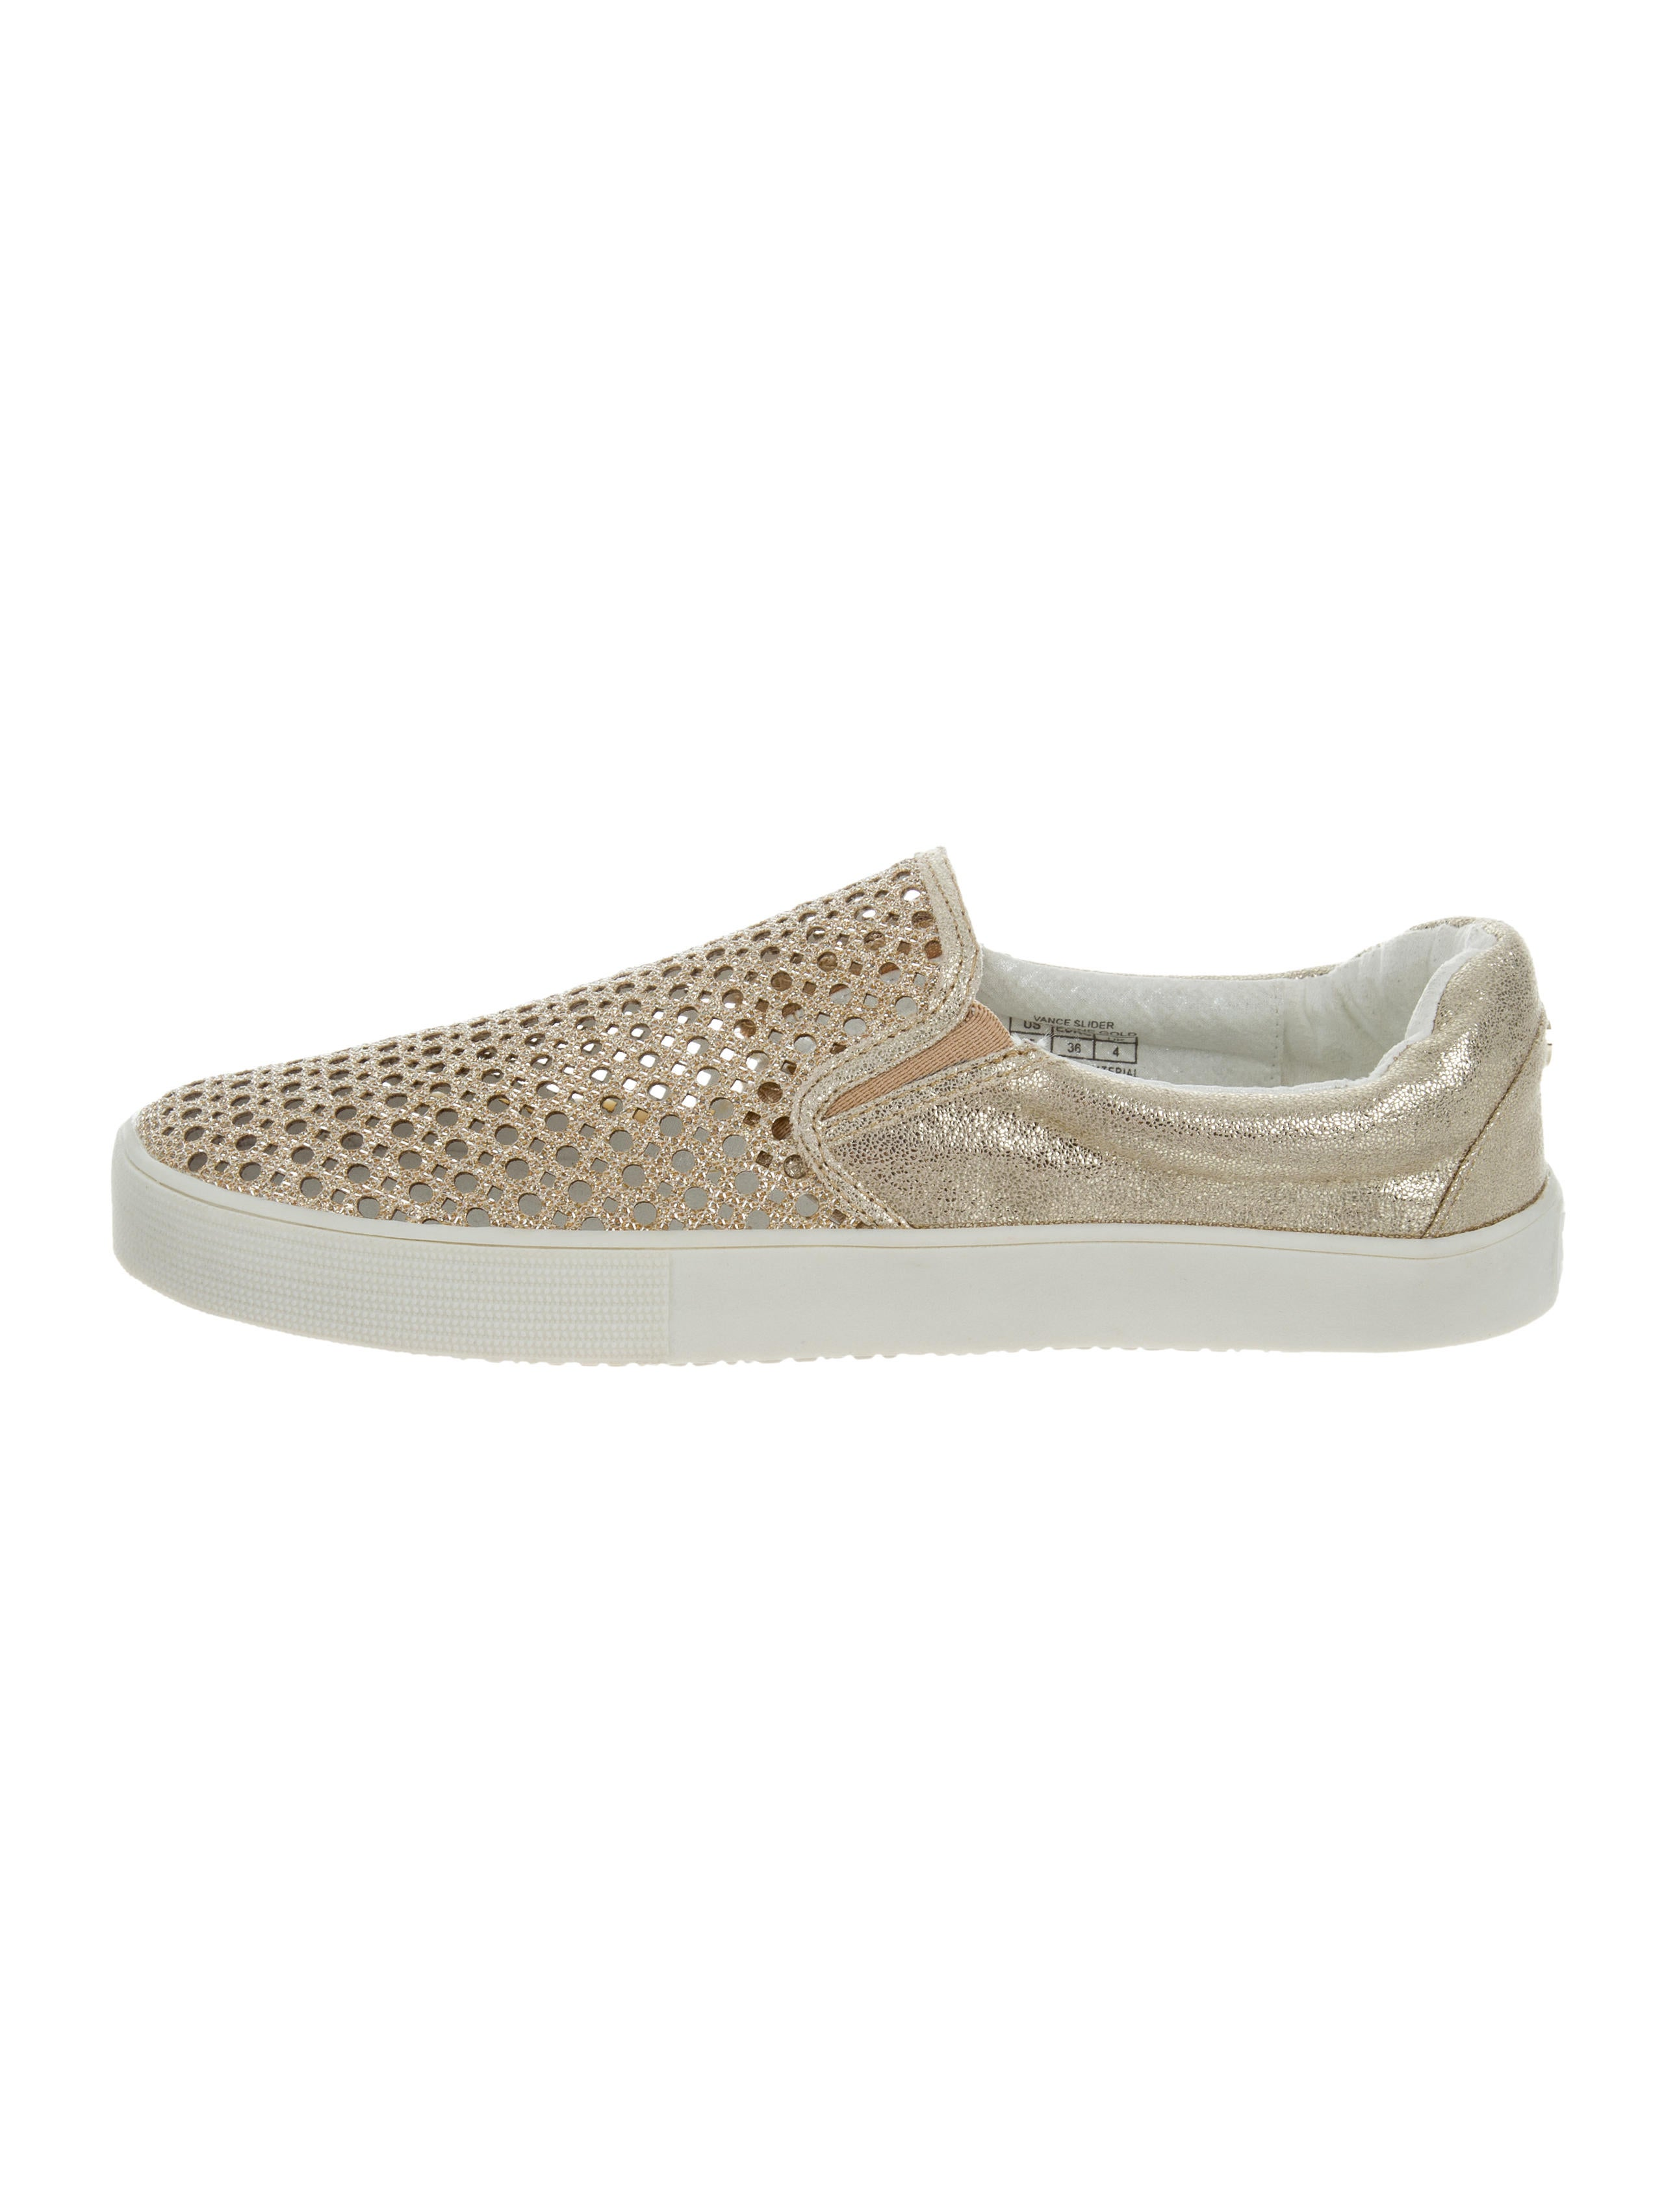 d4524f843a53b7 Stuart Weitzman Vance Metallic Sneakers - Shoes - WSU36374